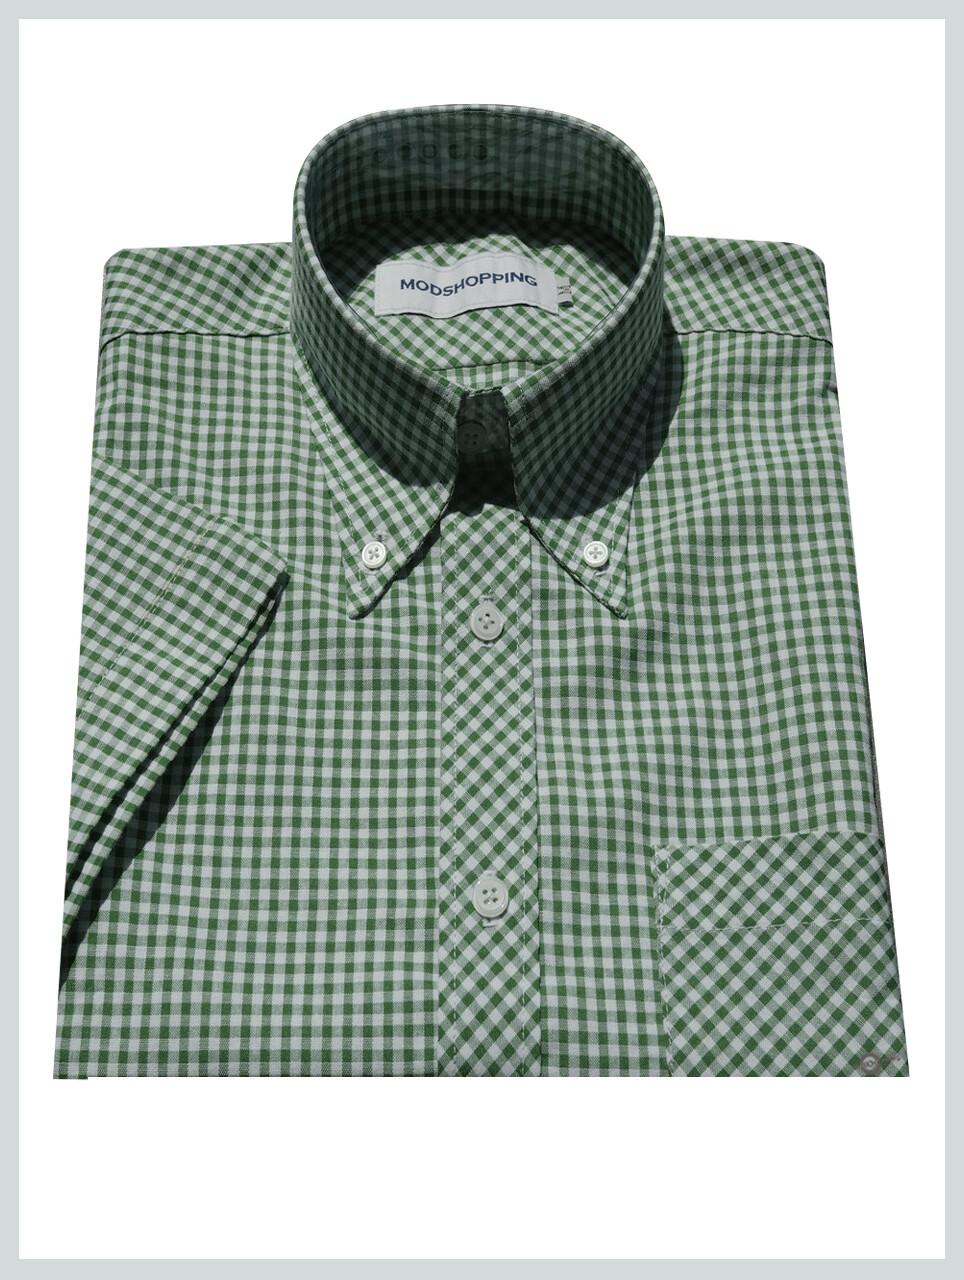 Green Gingham Shirt Green Short Sleeves Gingham Shirt Uk